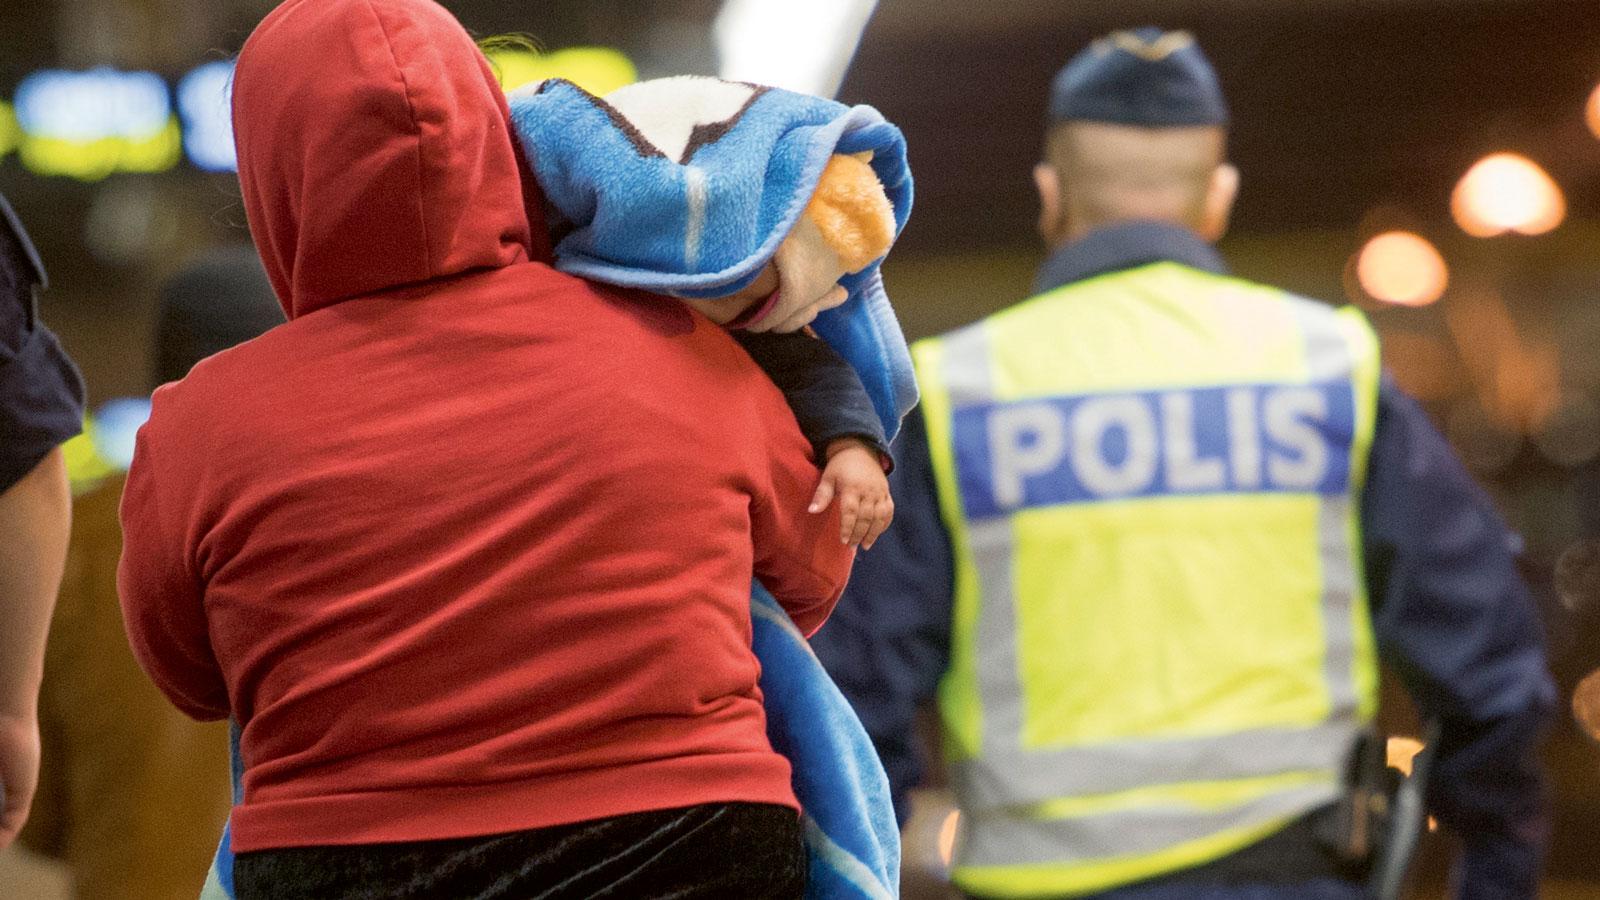 Polis sitt yrke trogen